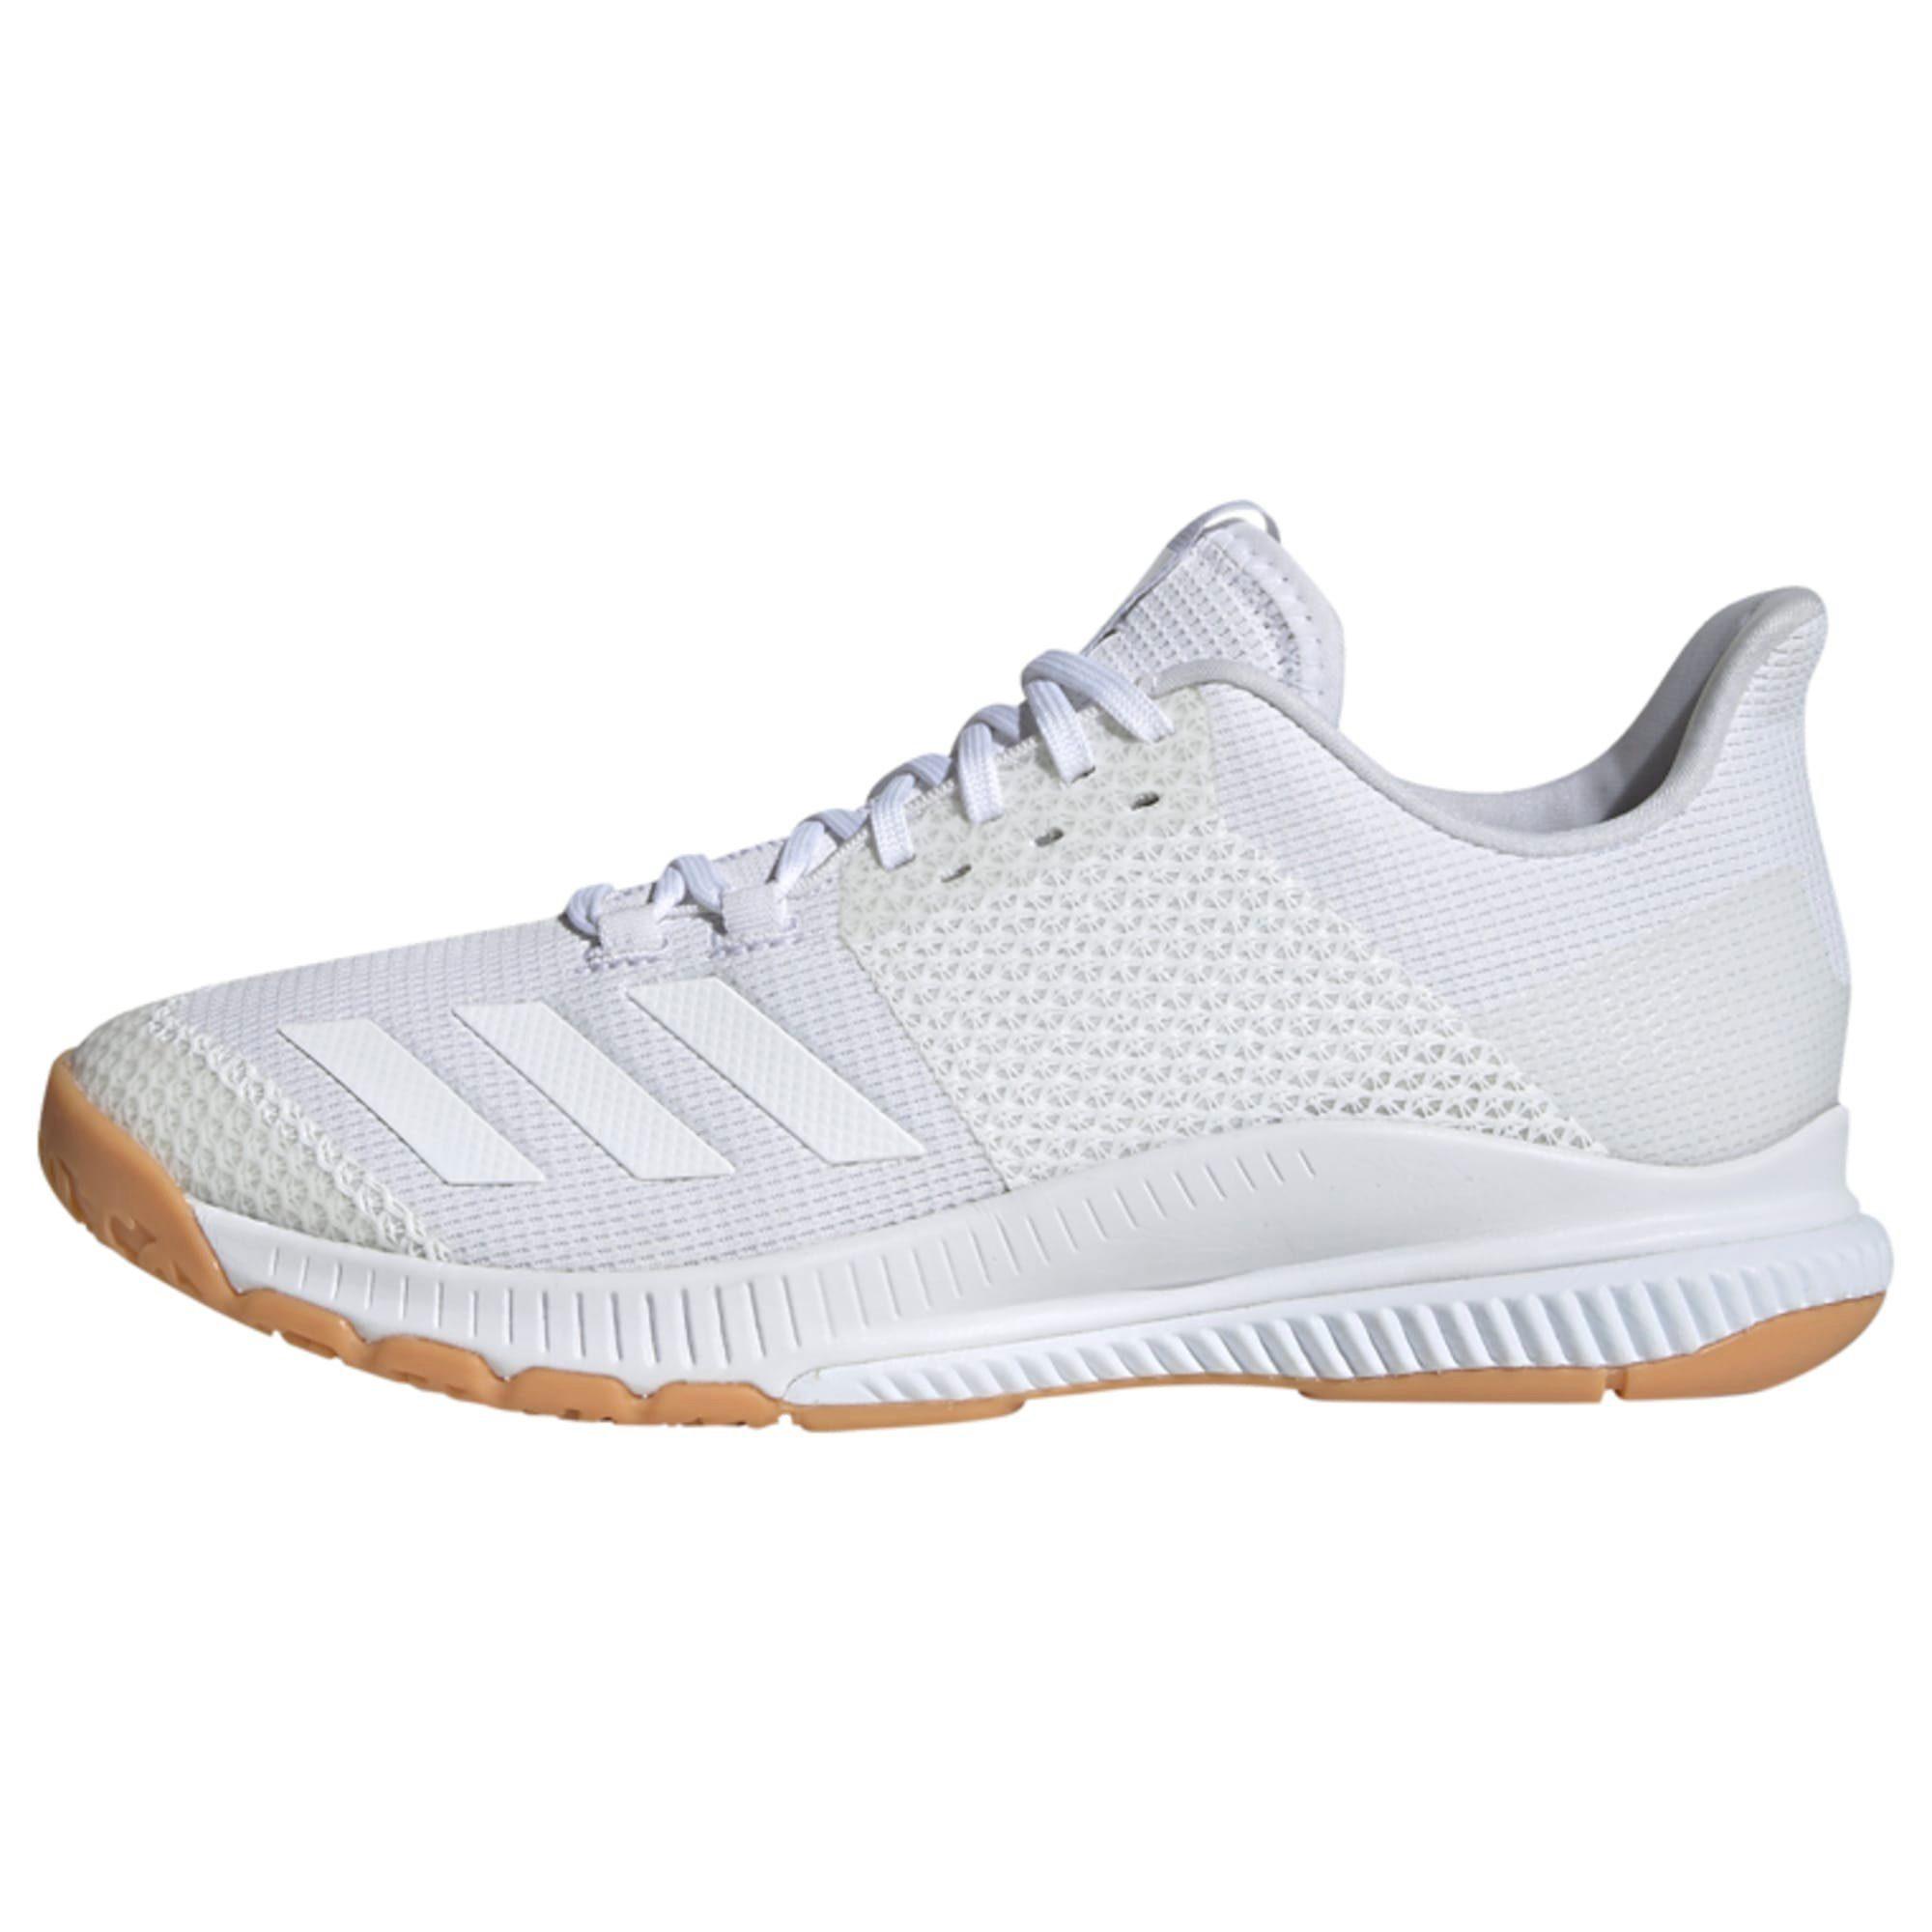 adidas Performance »Crazyflight Bounce 3 Schuh« Trainingsschuh Trainingsschuh online kaufen   OTTO